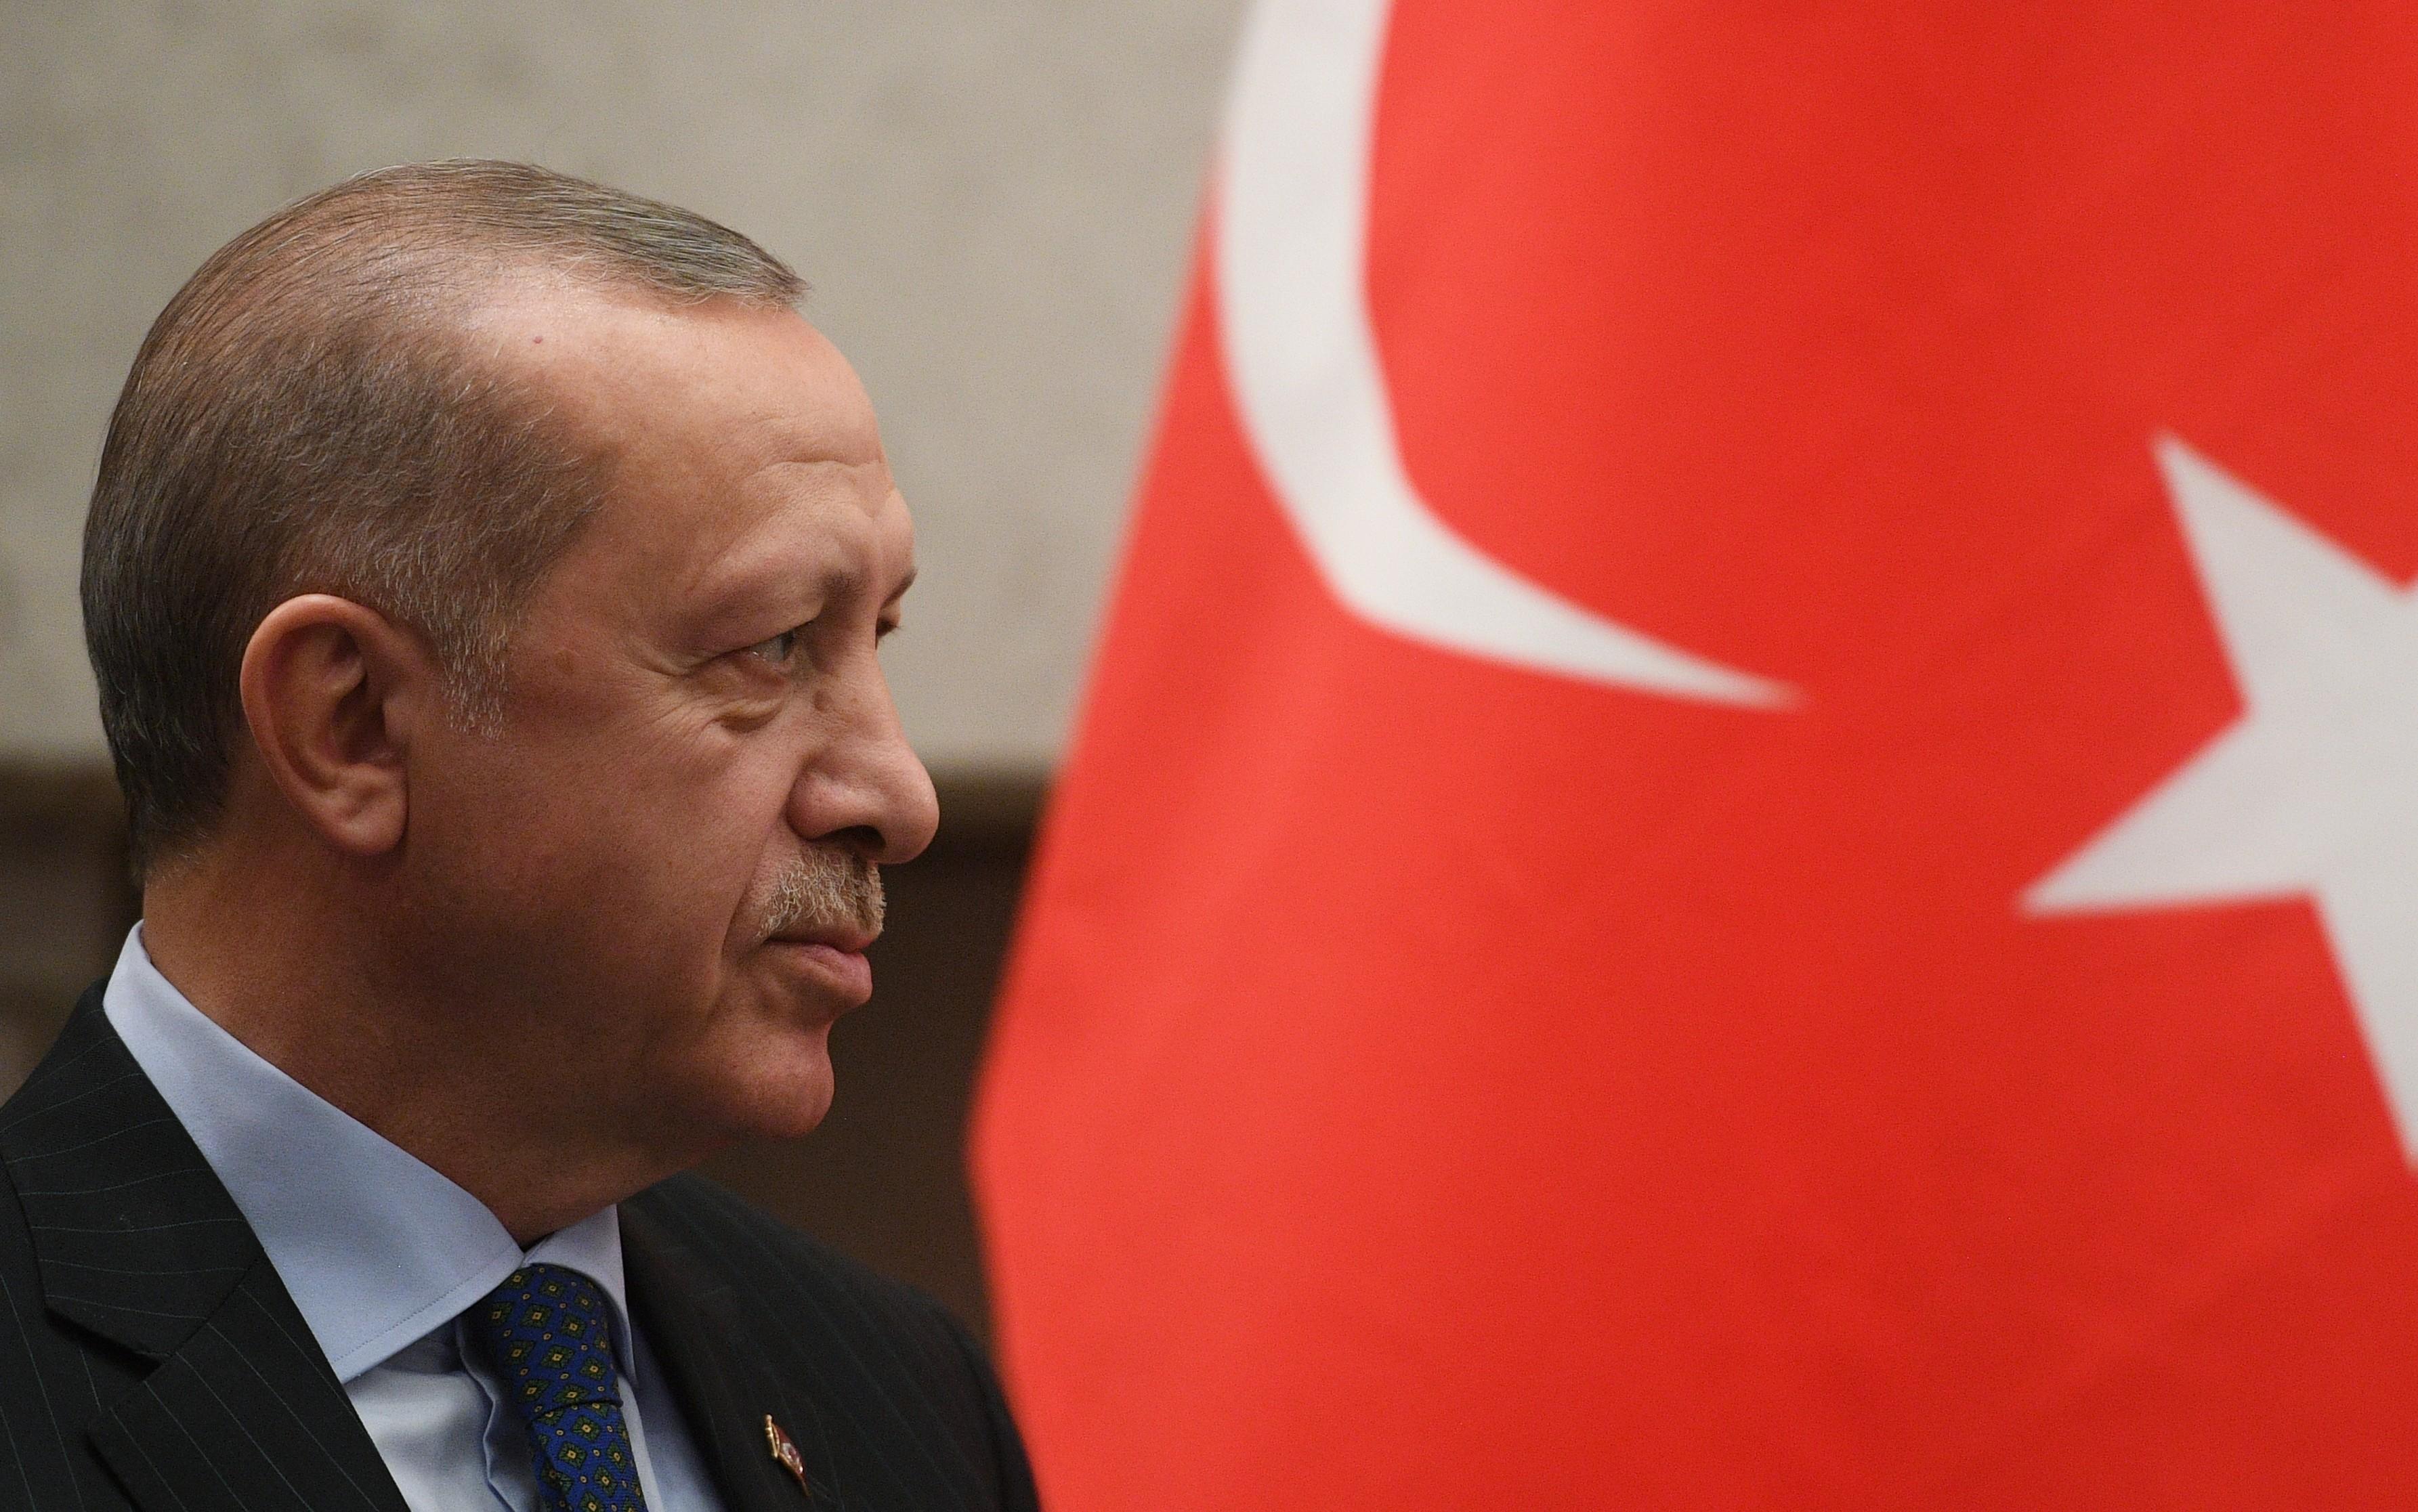 <p>Реджеп Эрдоган. Фото: &copy;РИА Новости/Владимир Астапкович</p>